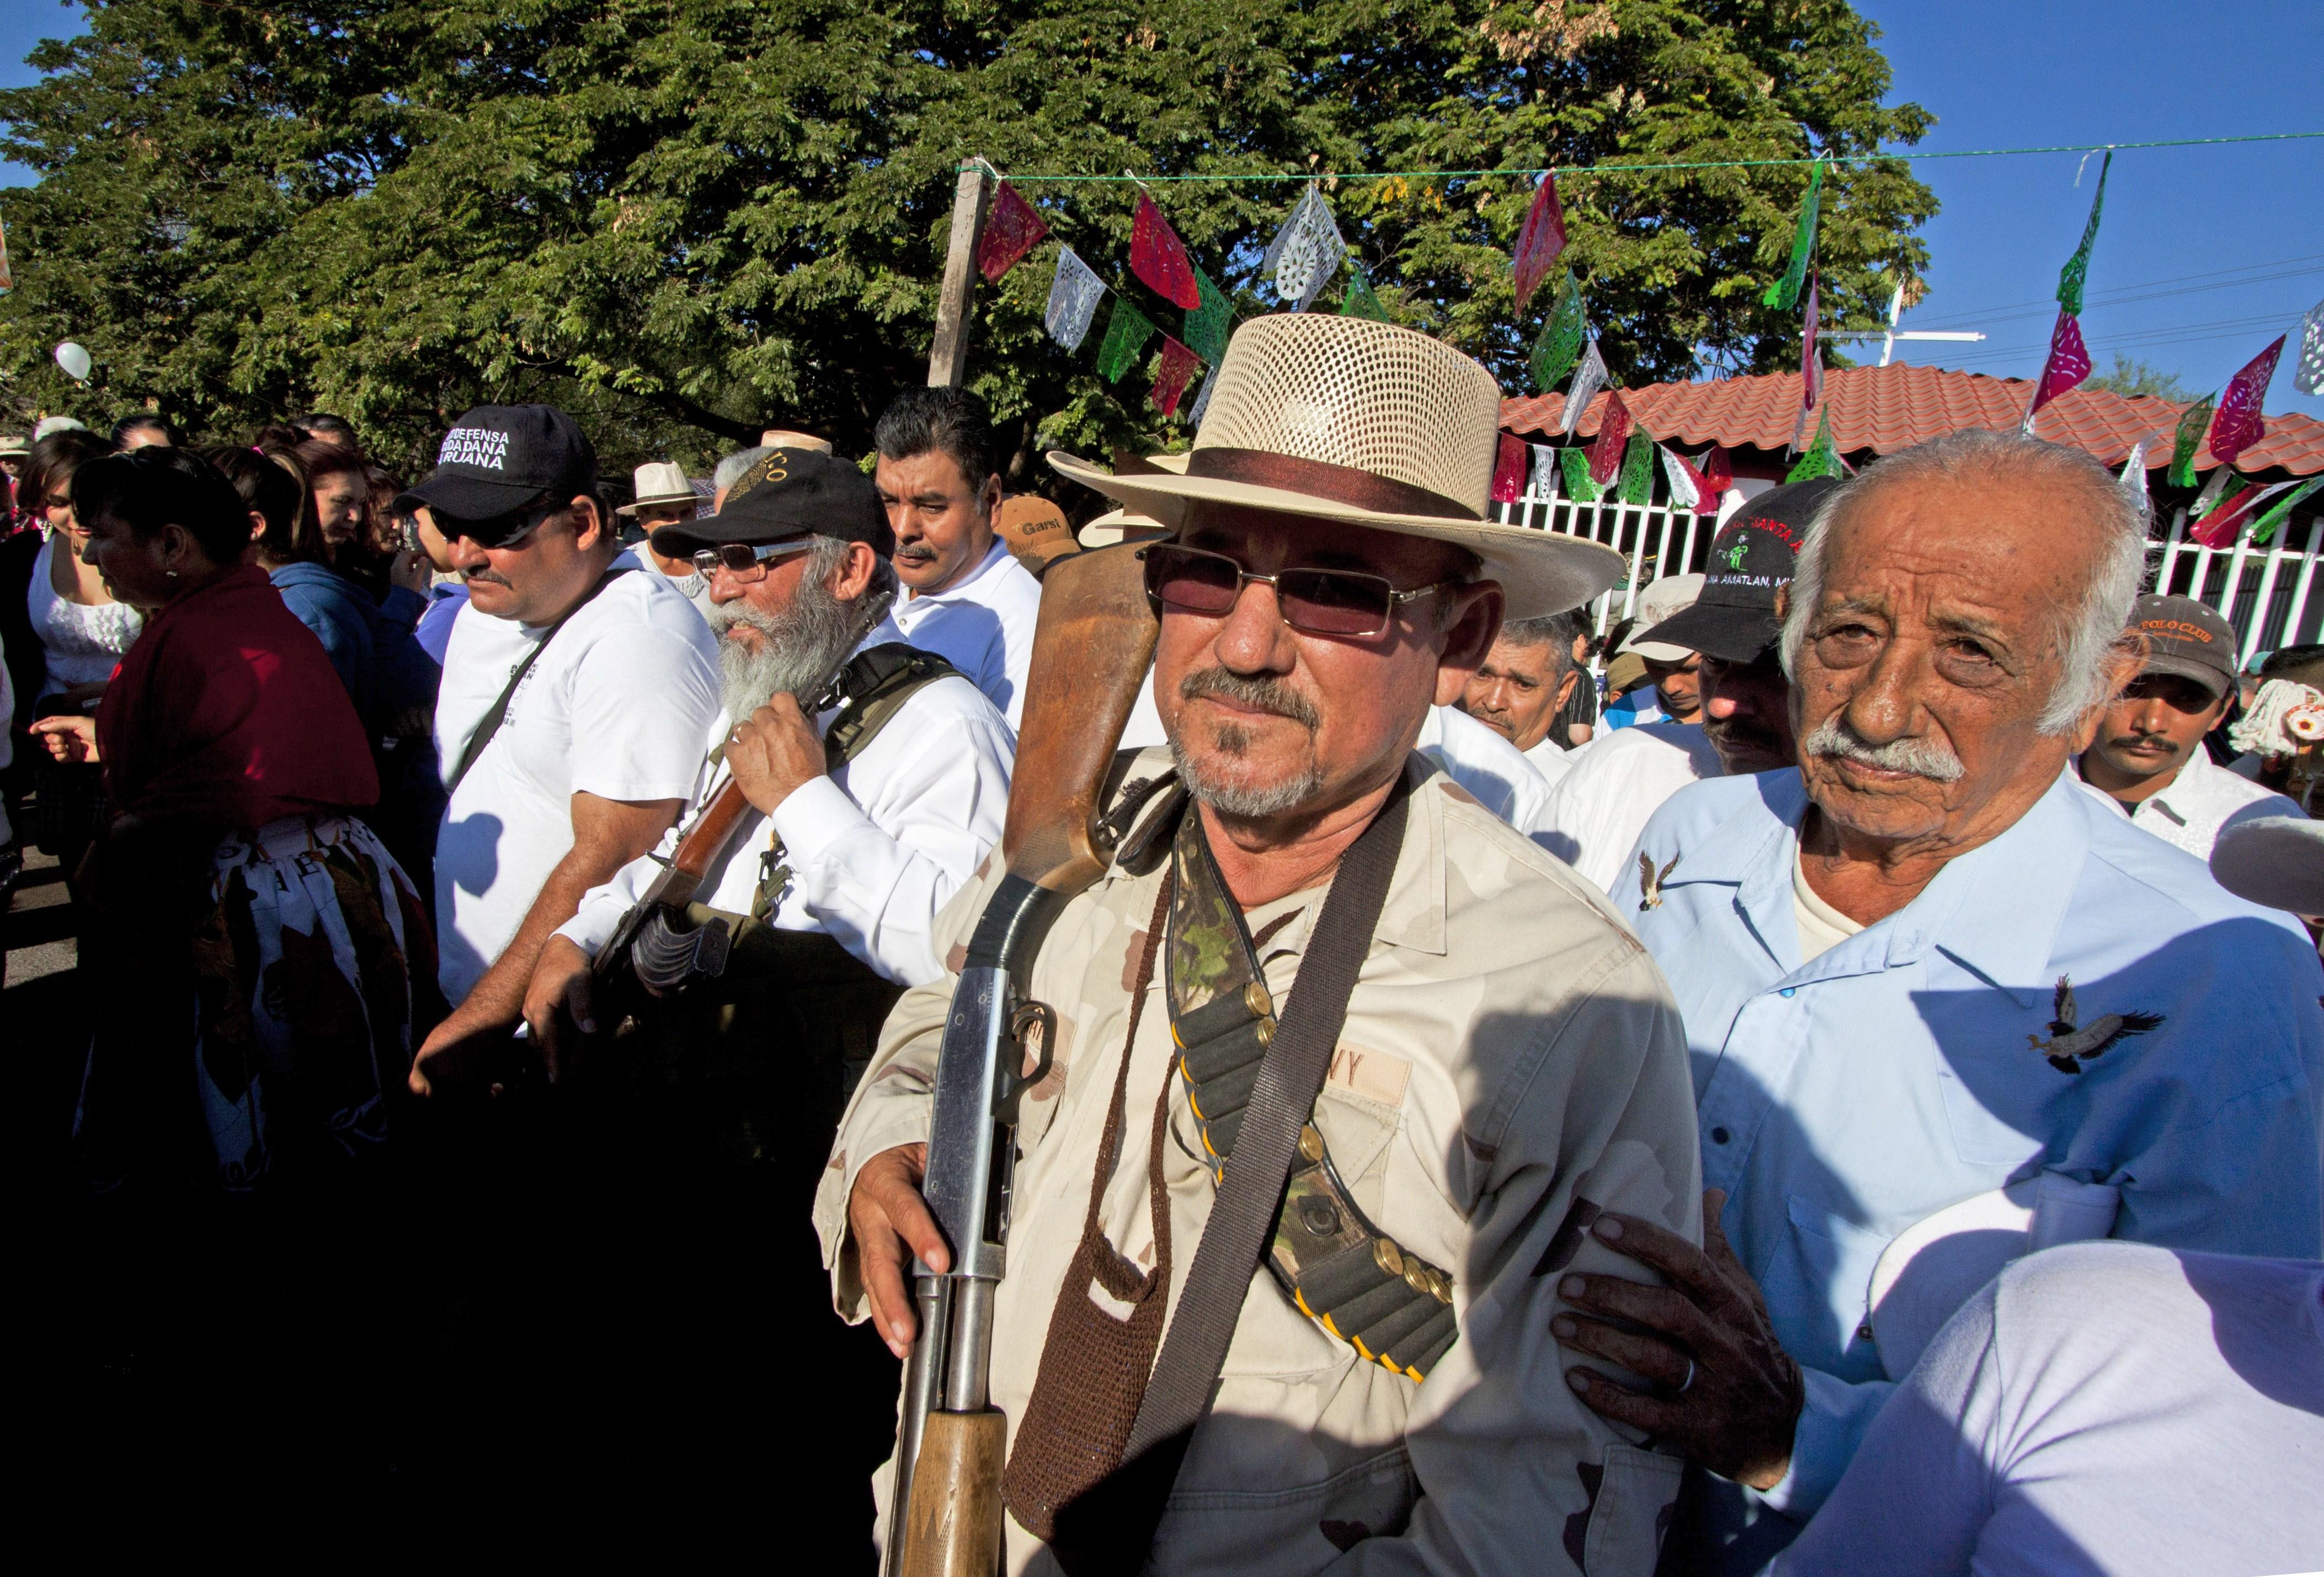 Hipolito Mora (C), leader of the self-protection militia walks in La Ruana community, state of Michoacan, Mexico, on February 24, 2014.